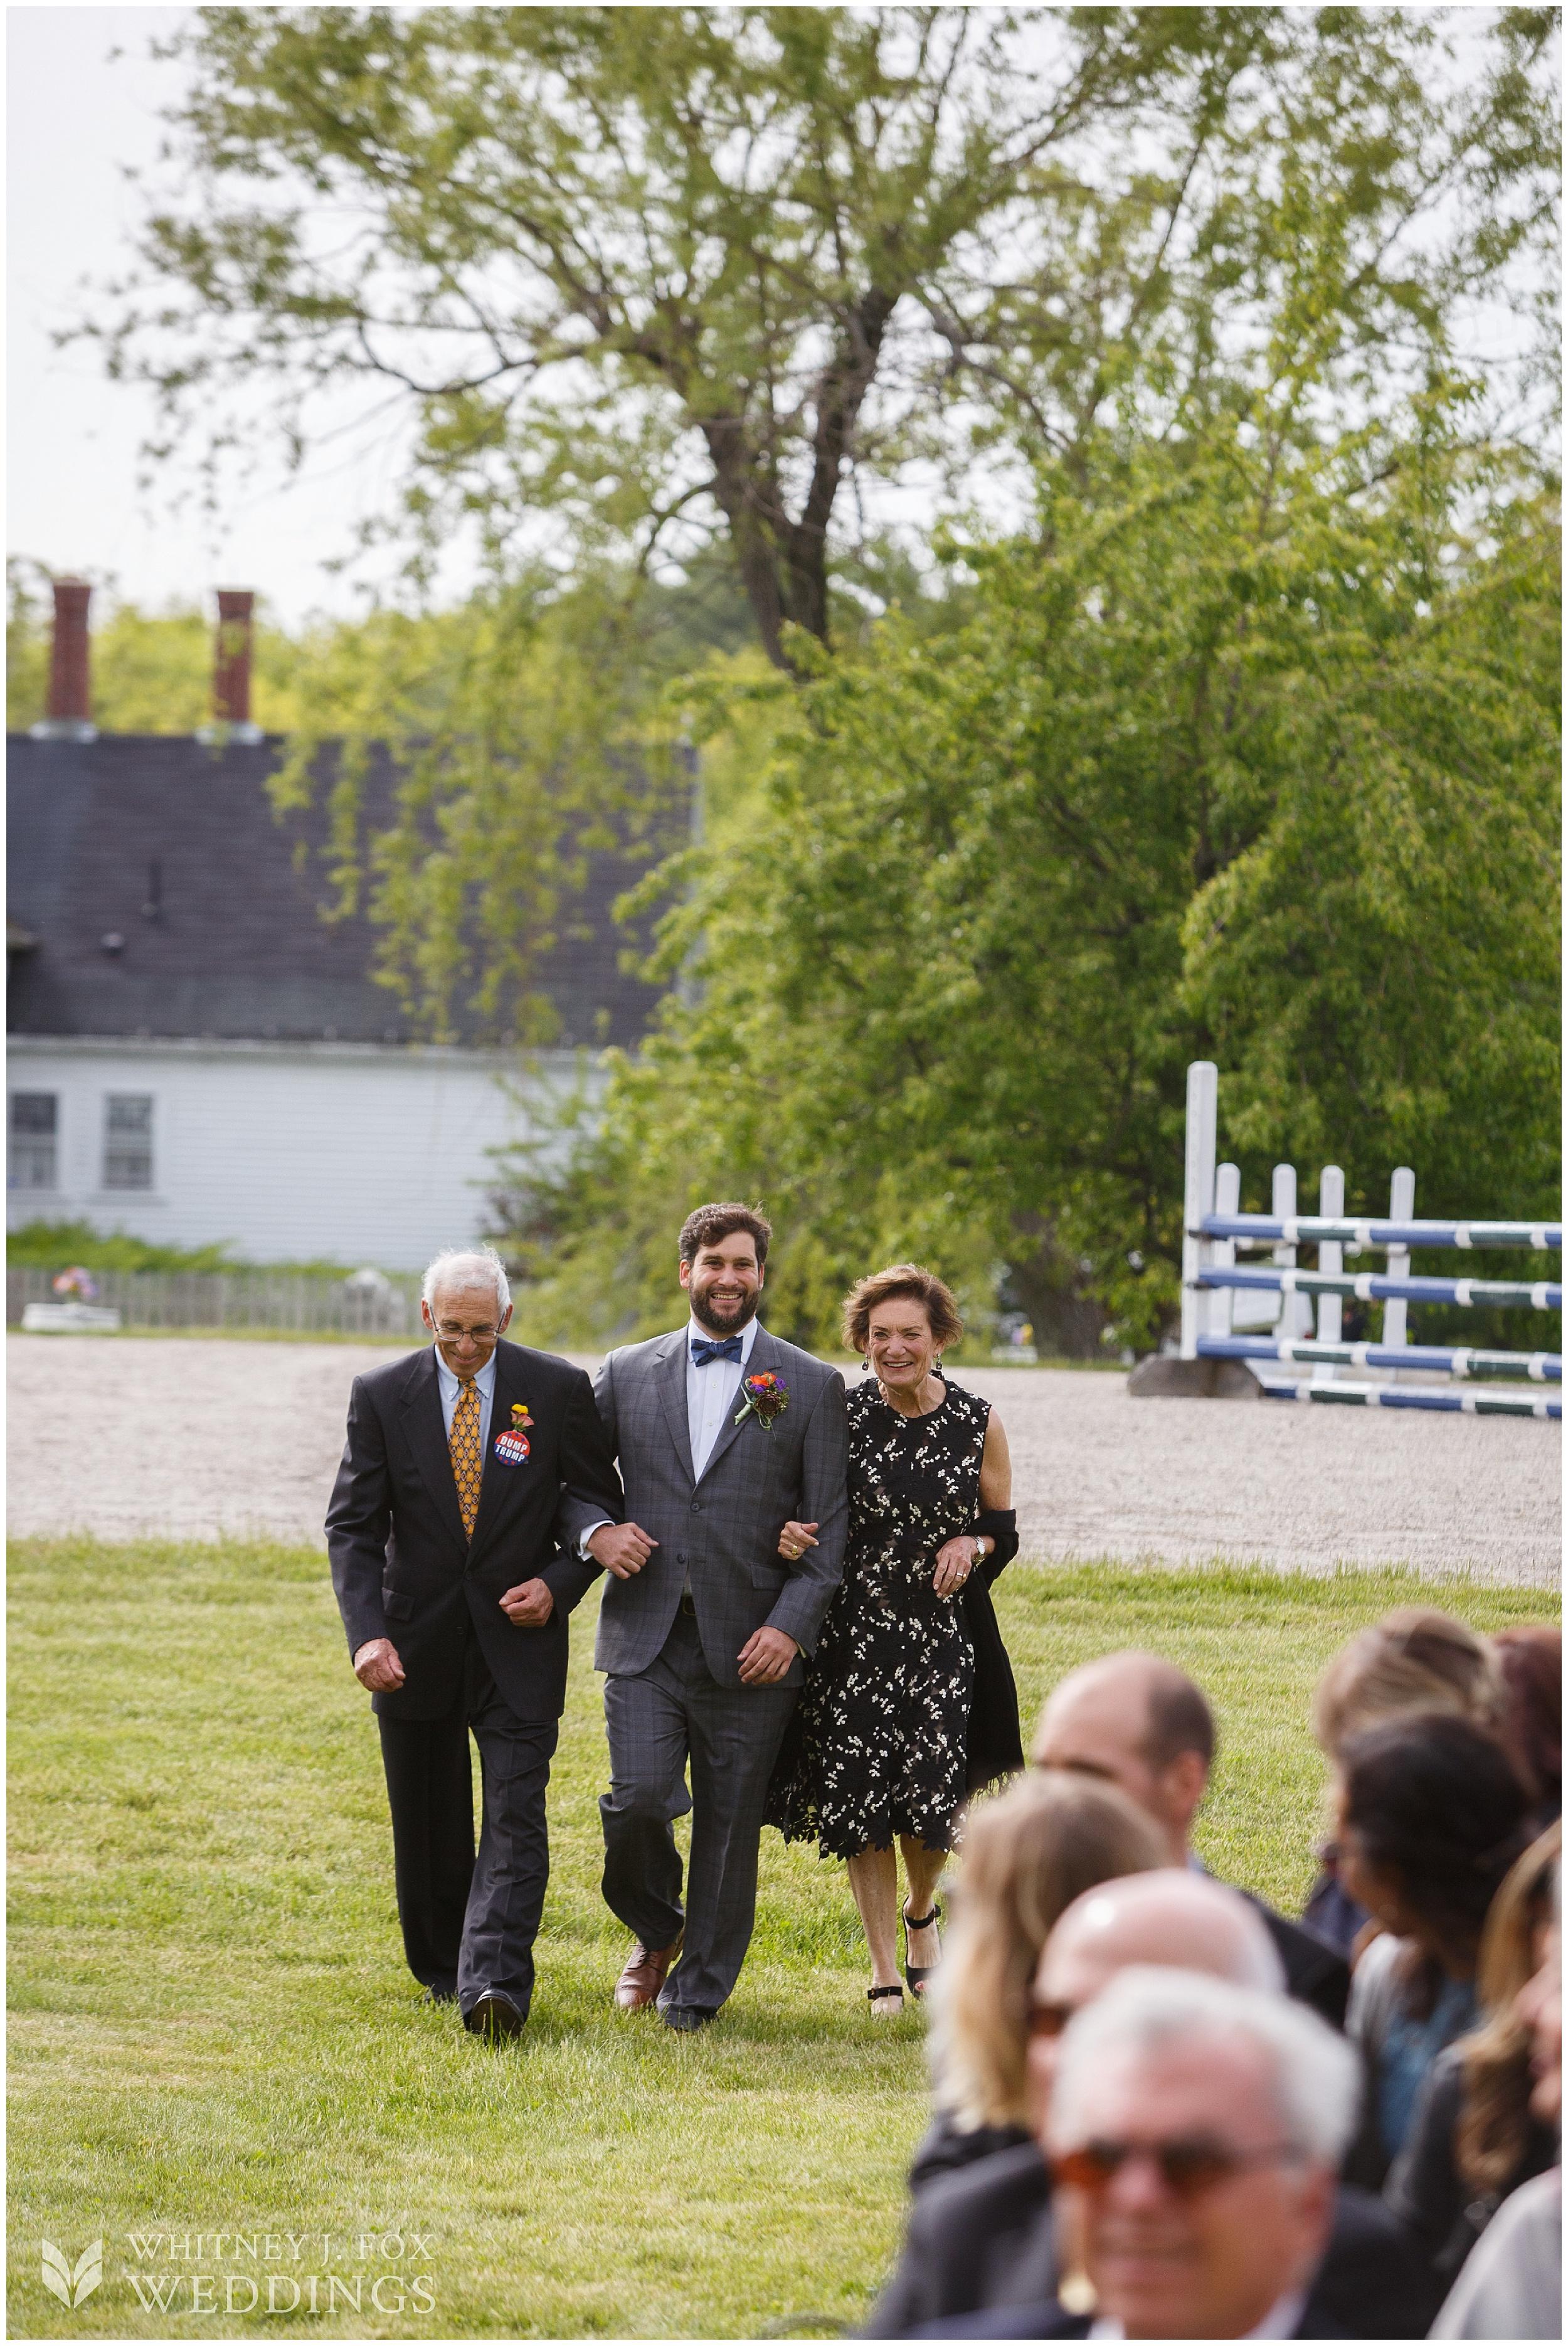 32_60_tai_josh_the_homestead_rest_be_thankful_farm_lyman_maine_photographer_whitney_j_fox_weddings_1206.jpg